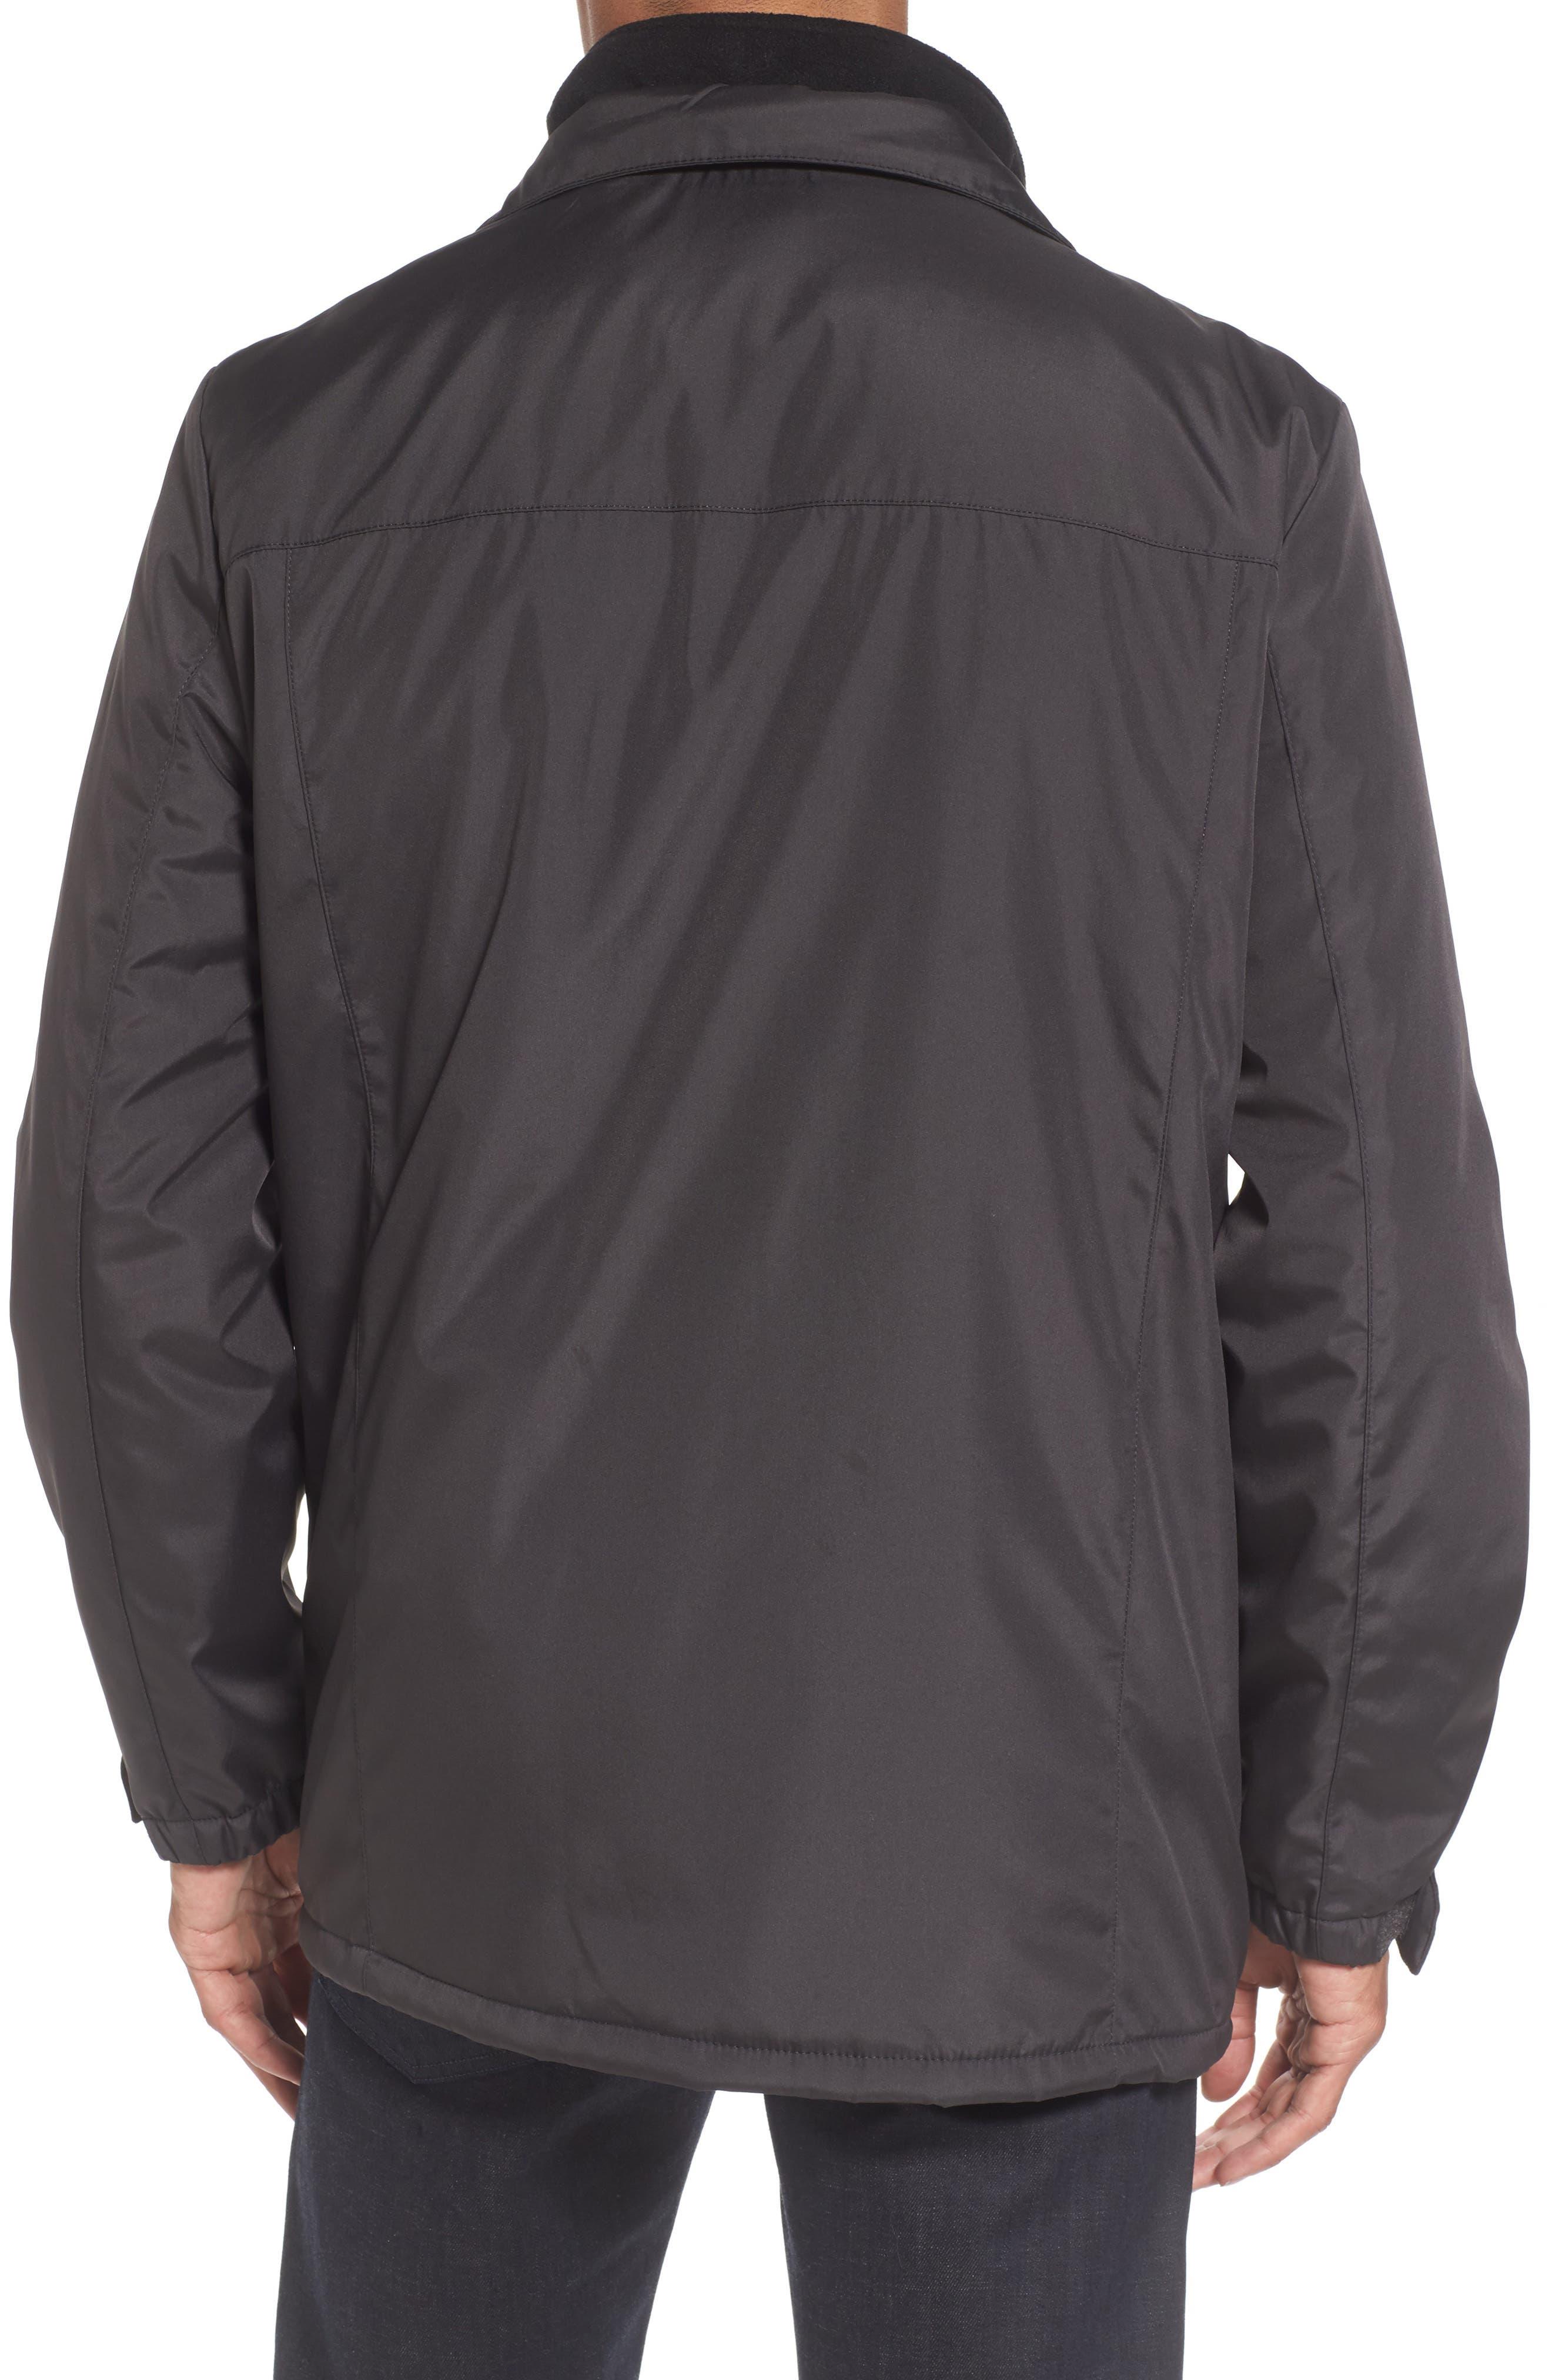 Hooded Jacket with Inset Fleece Bib,                             Alternate thumbnail 14, color,